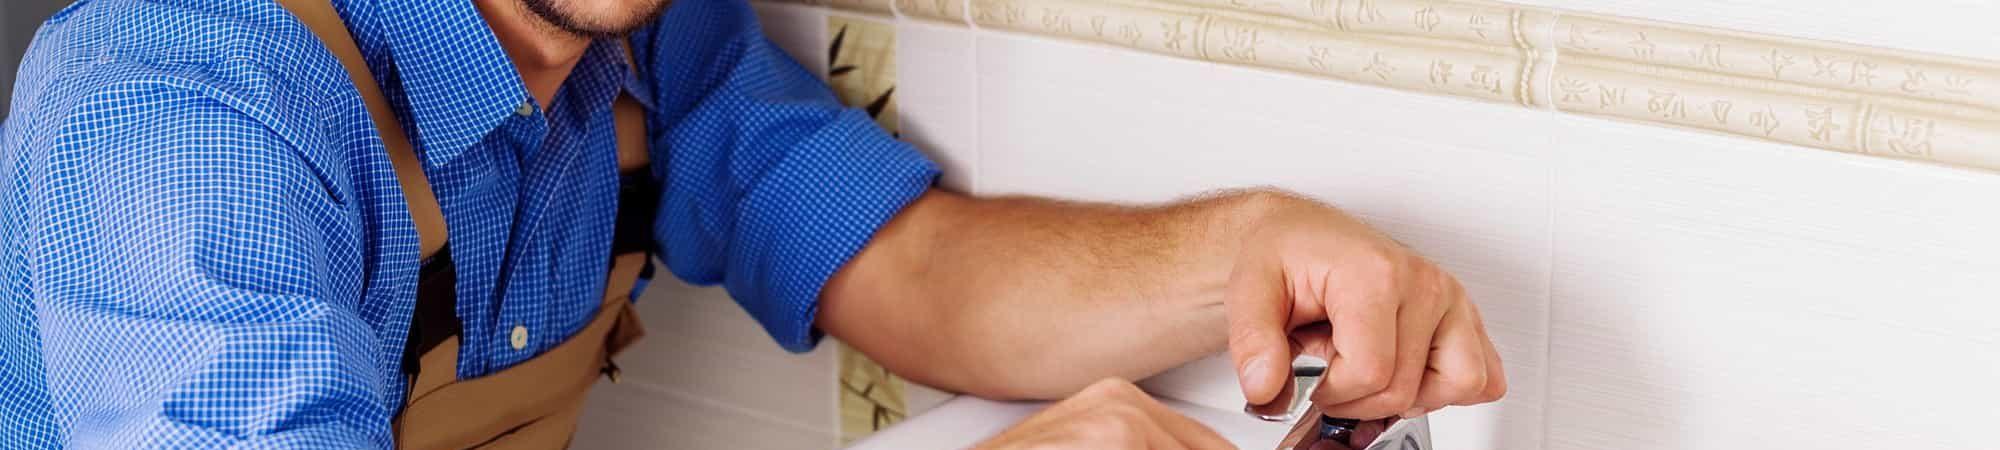 plumber-working-sink-small-bathroom-home